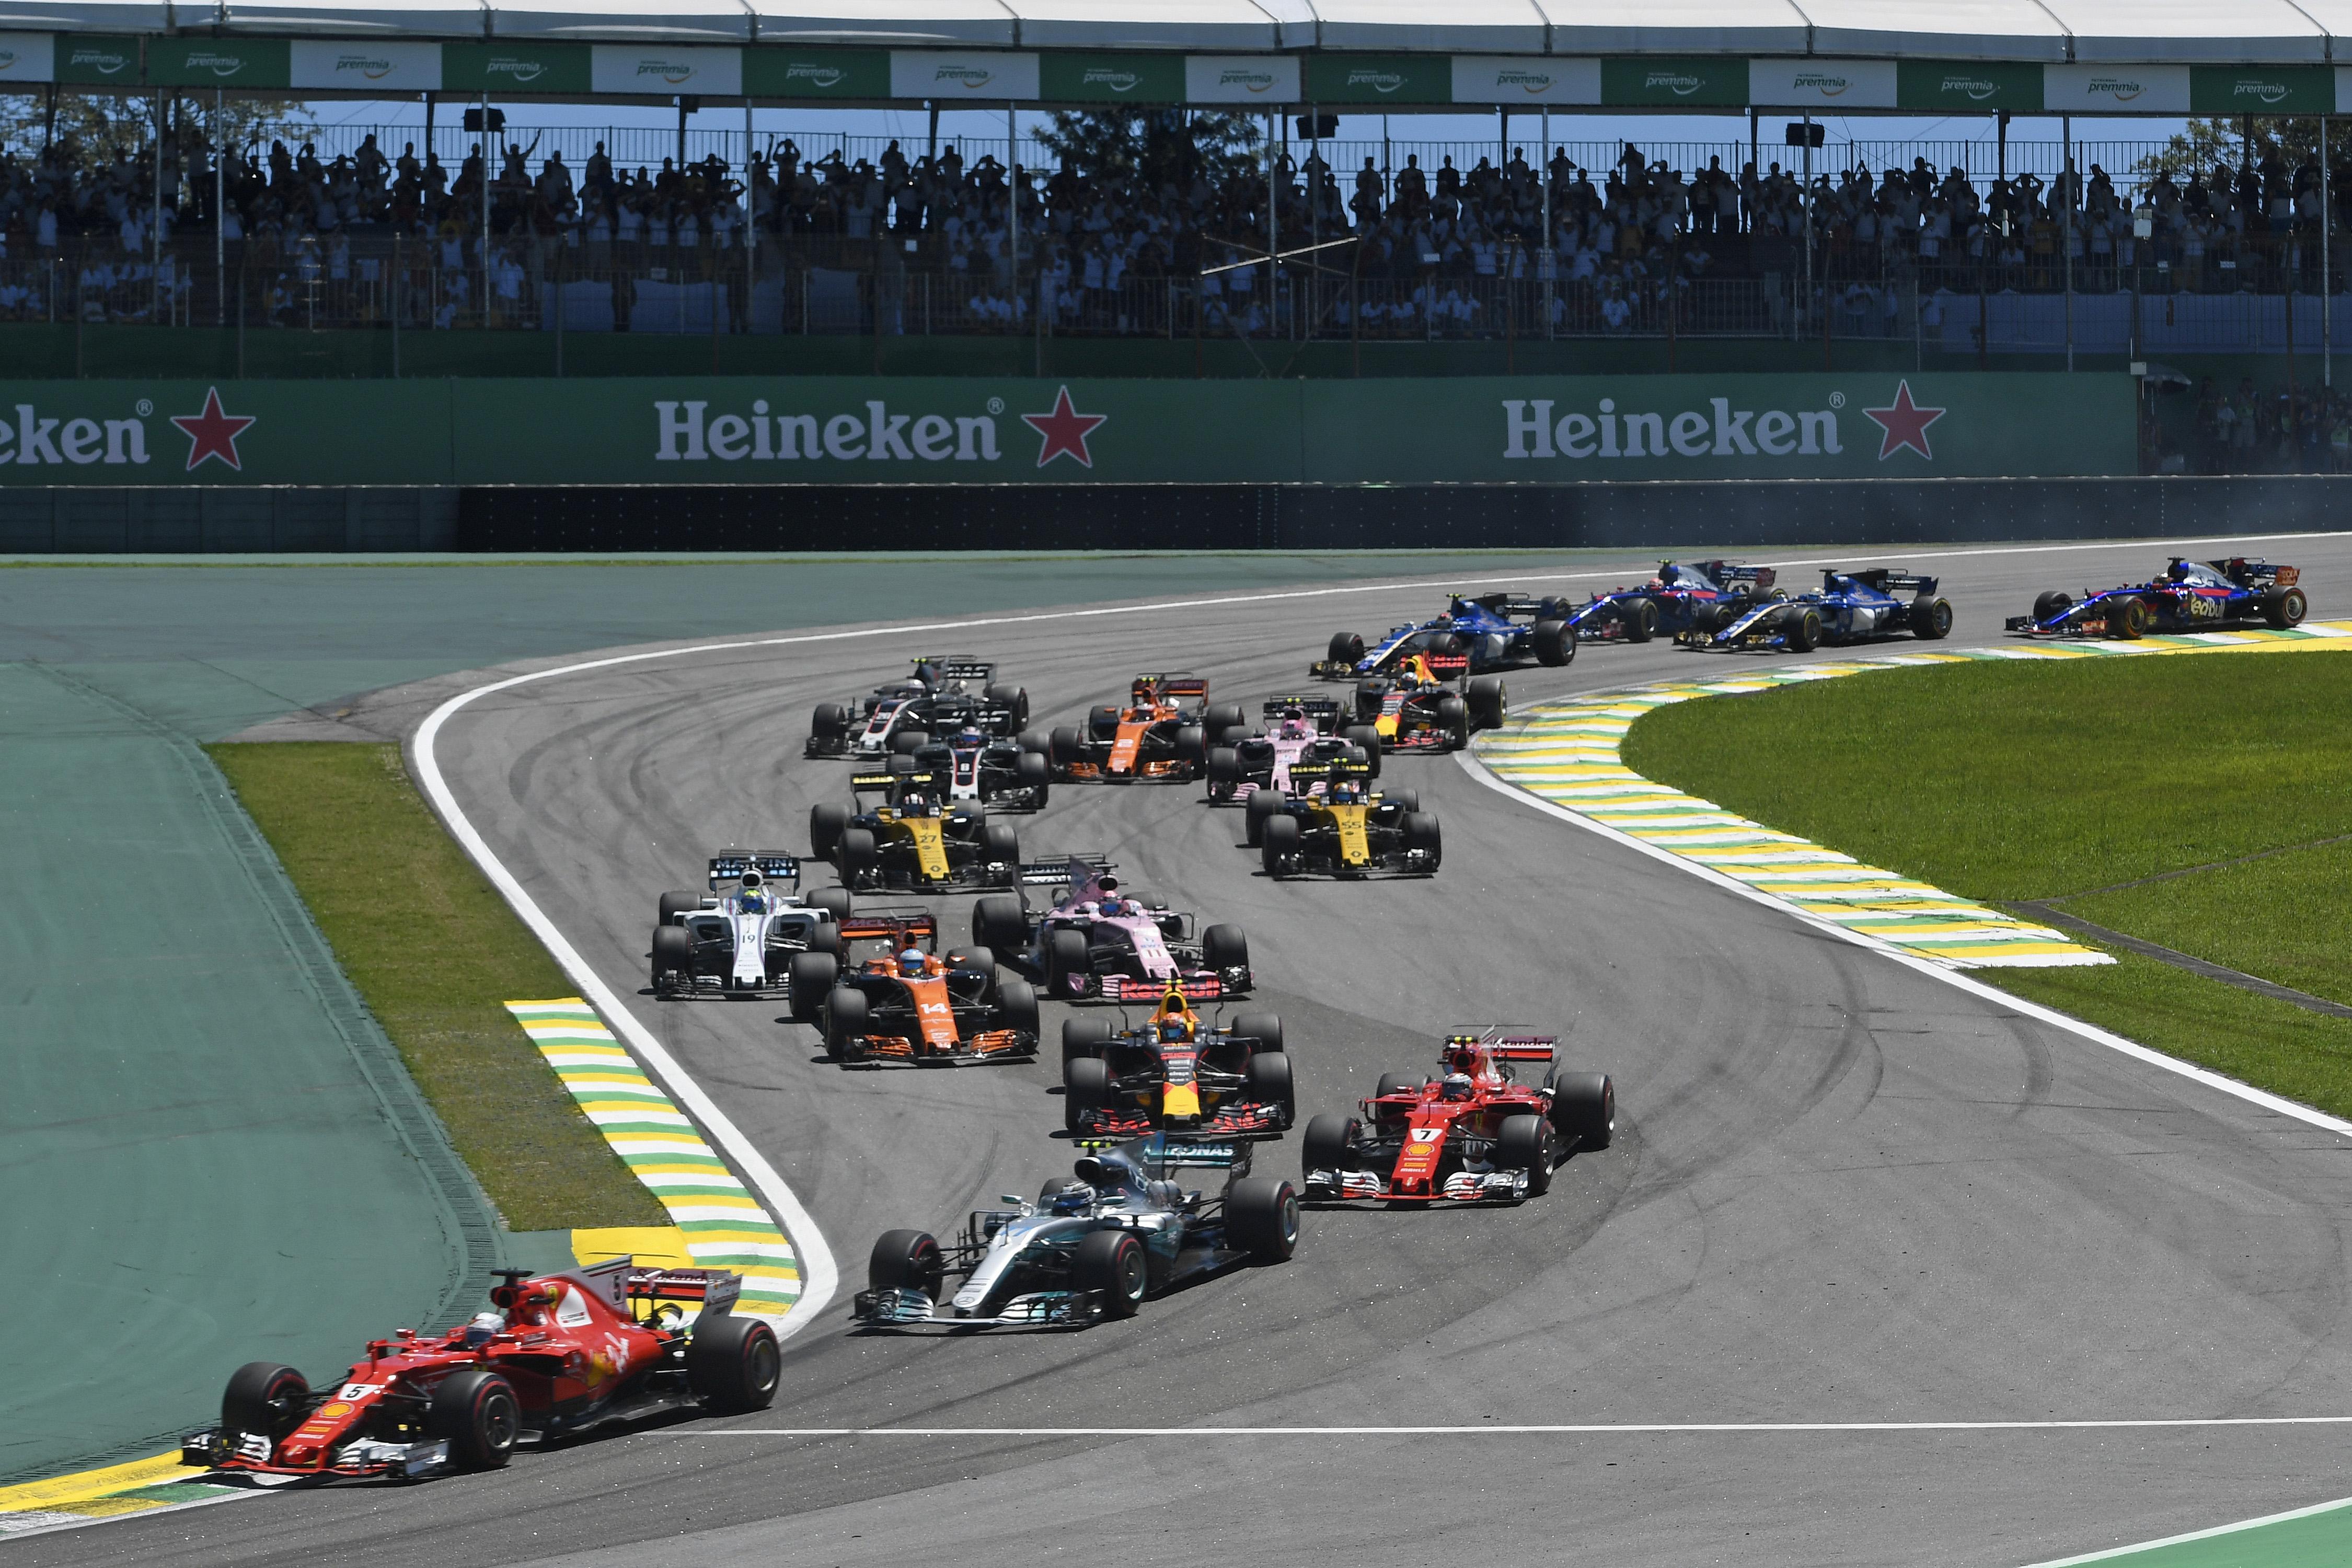 F1 - 2018 BRAZILIAN GRAND PRIX